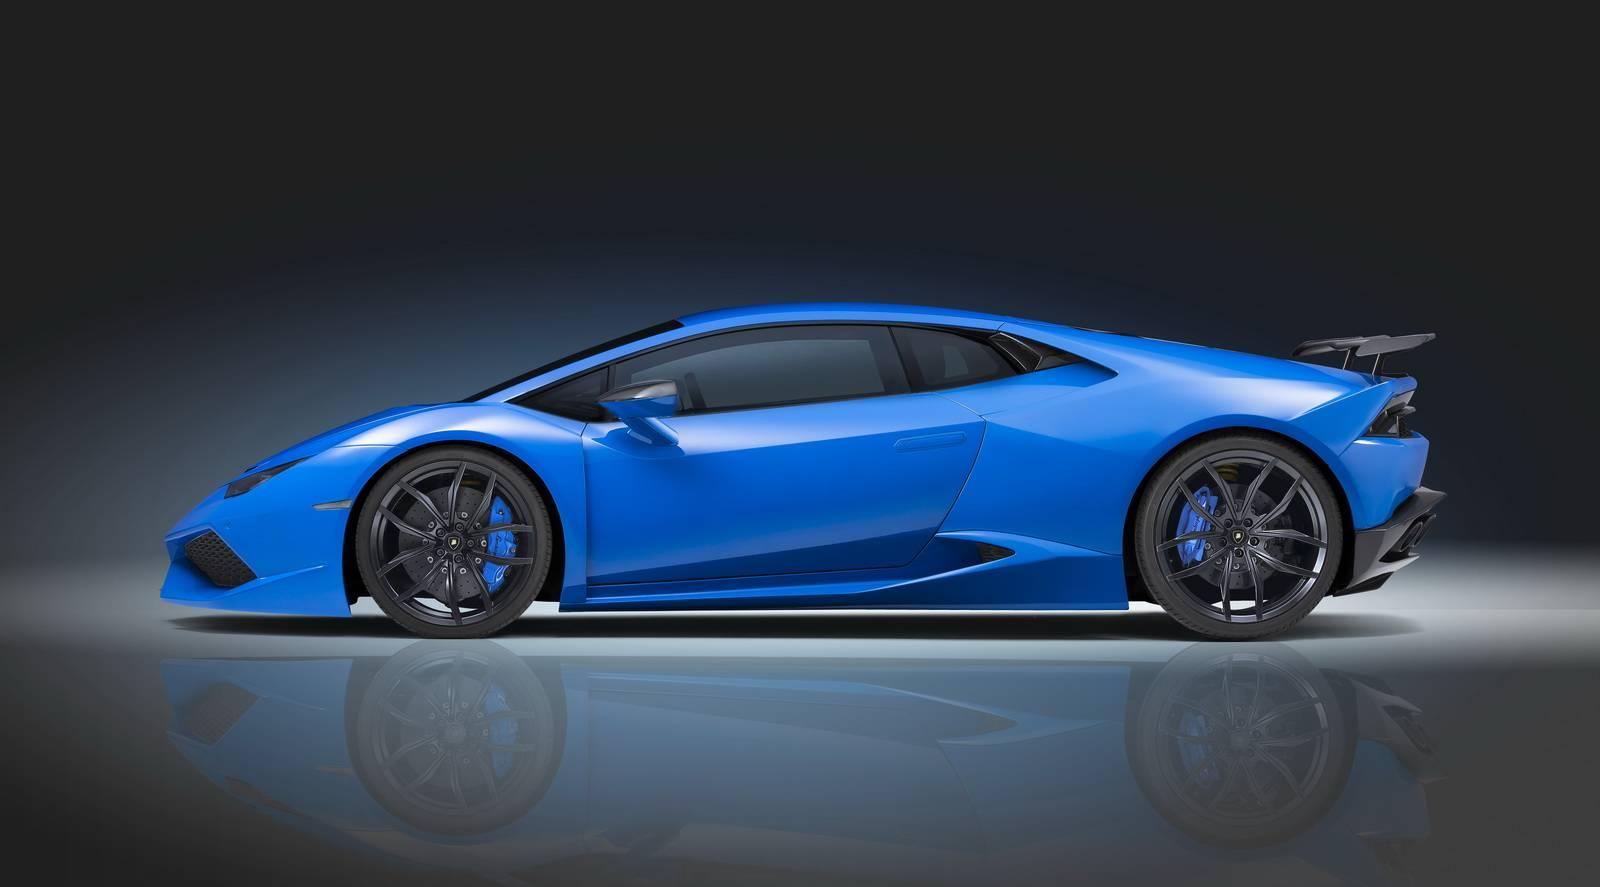 Official: Novitec Torado Lamborghini Huracan N-Largo - GTspirit